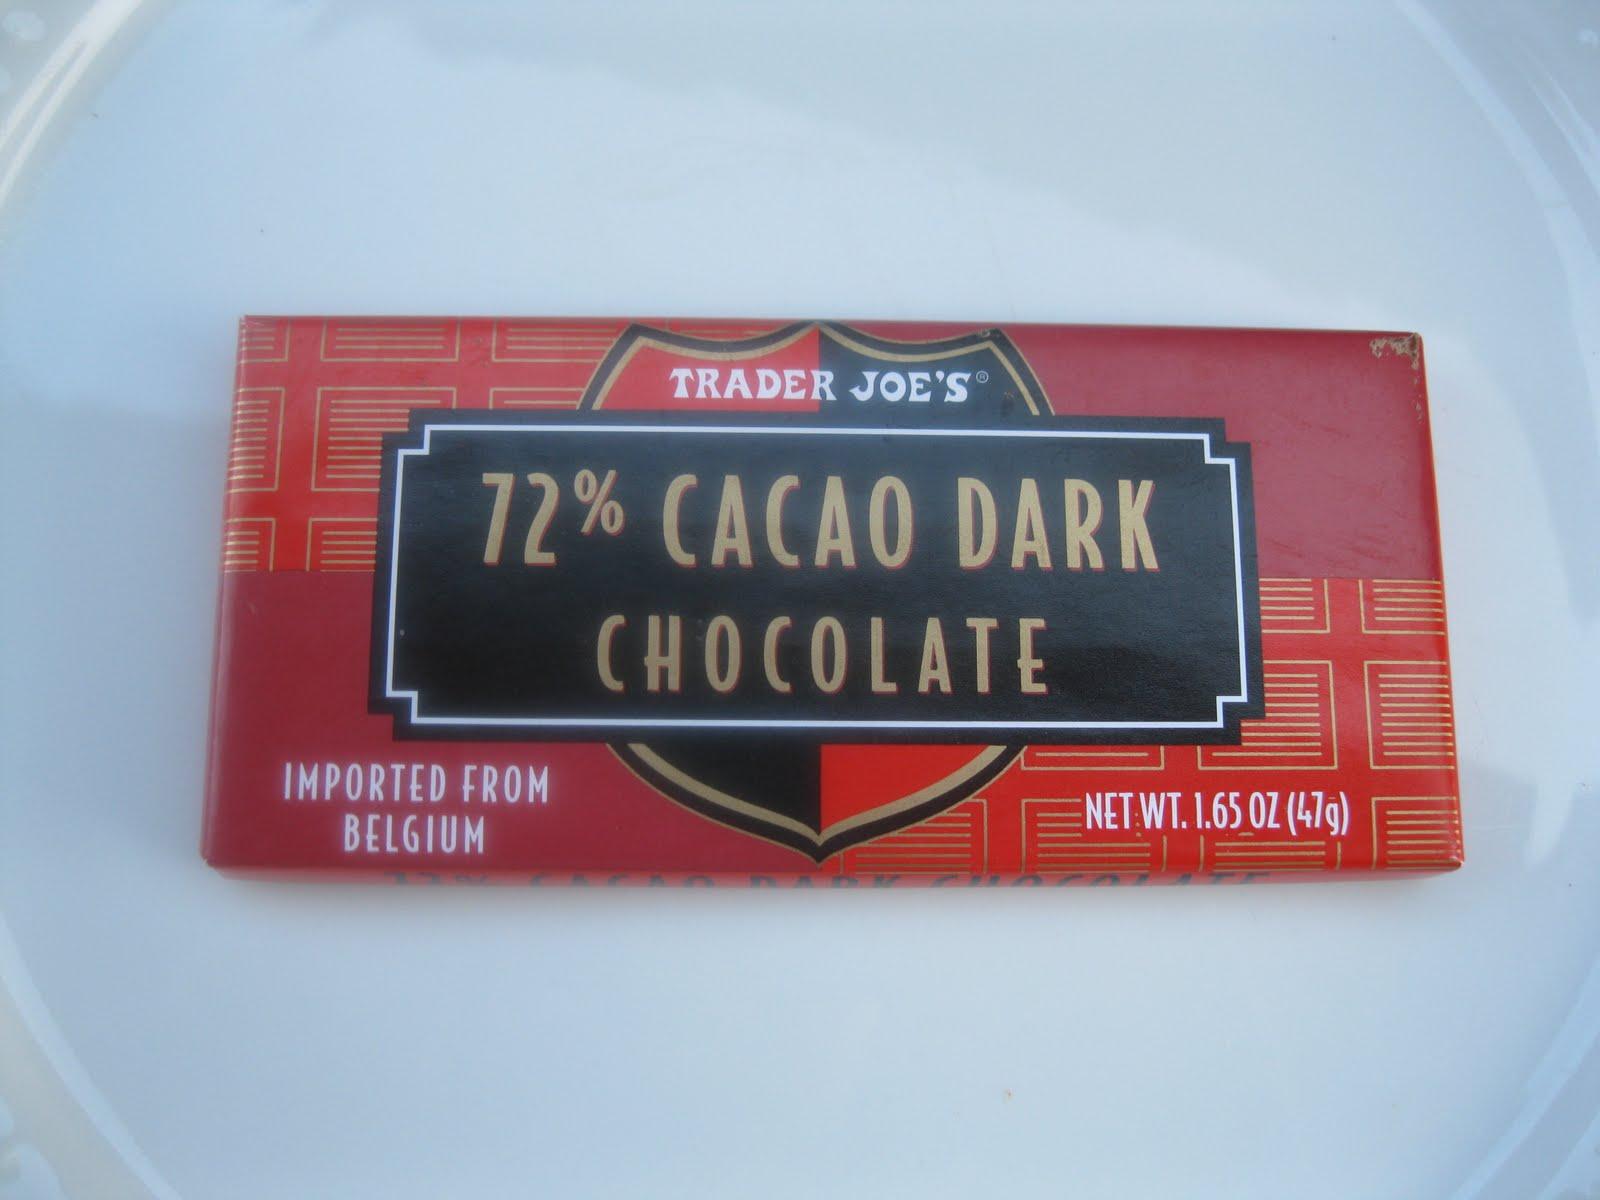 The District Chocoholic: Trader Joe's 72% Cocoa Dark